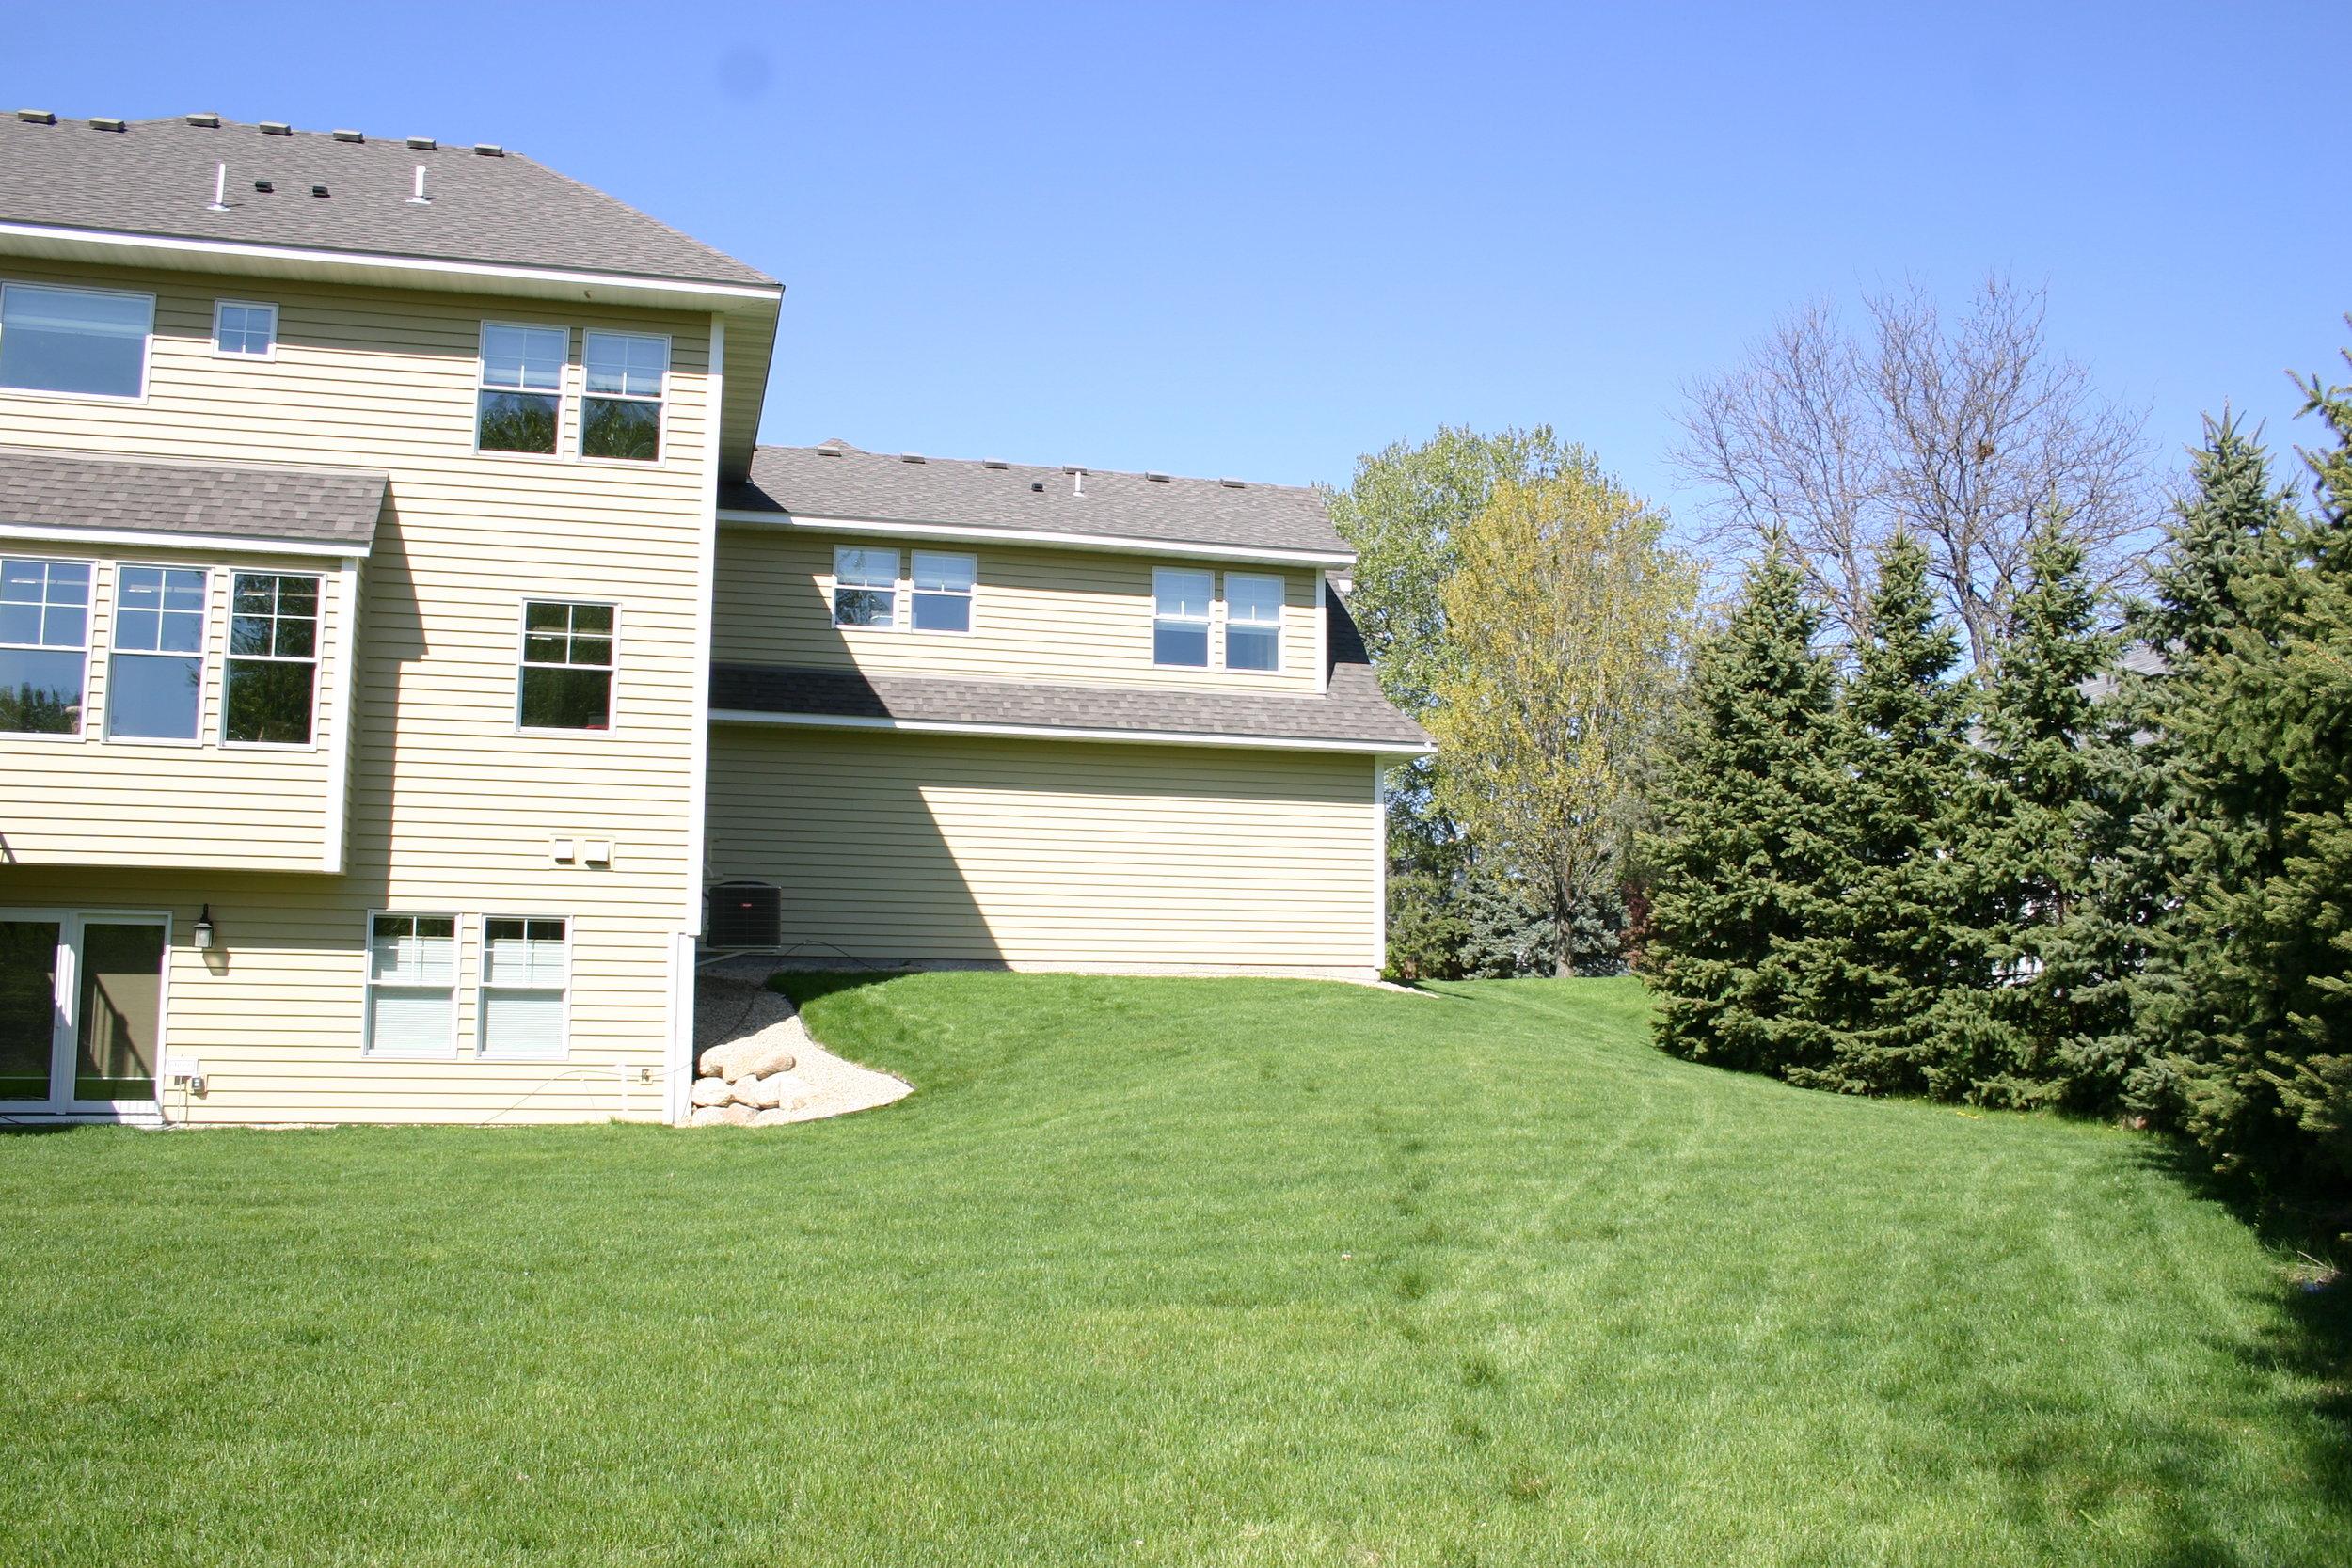 Before: Sharp angles and tall corners dominate the backyard.